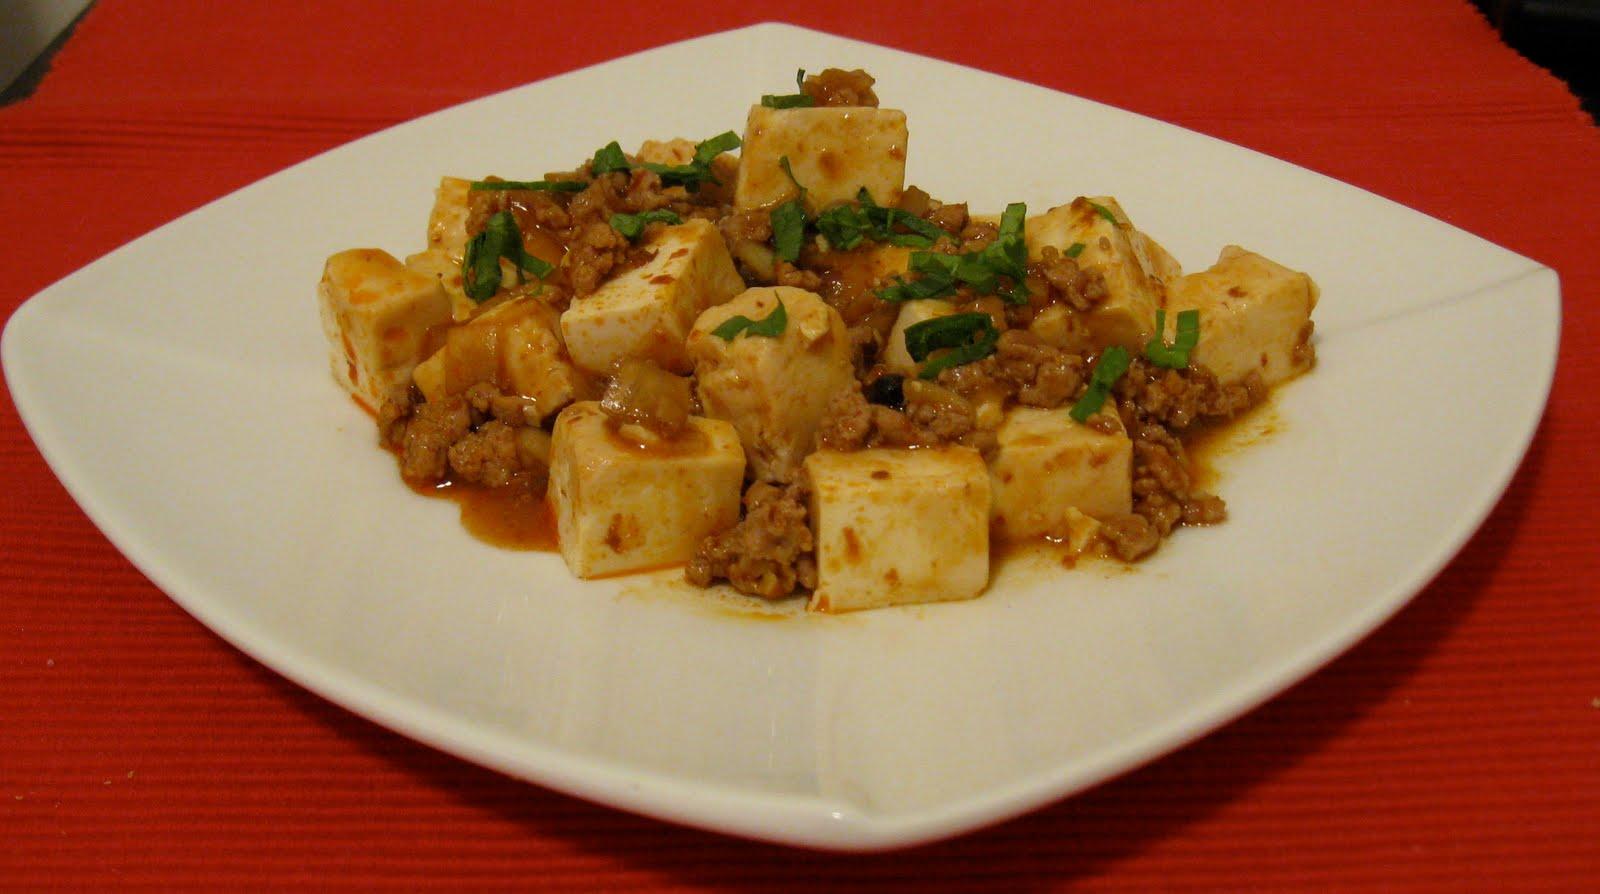 Working Lunch: Mapo tofu